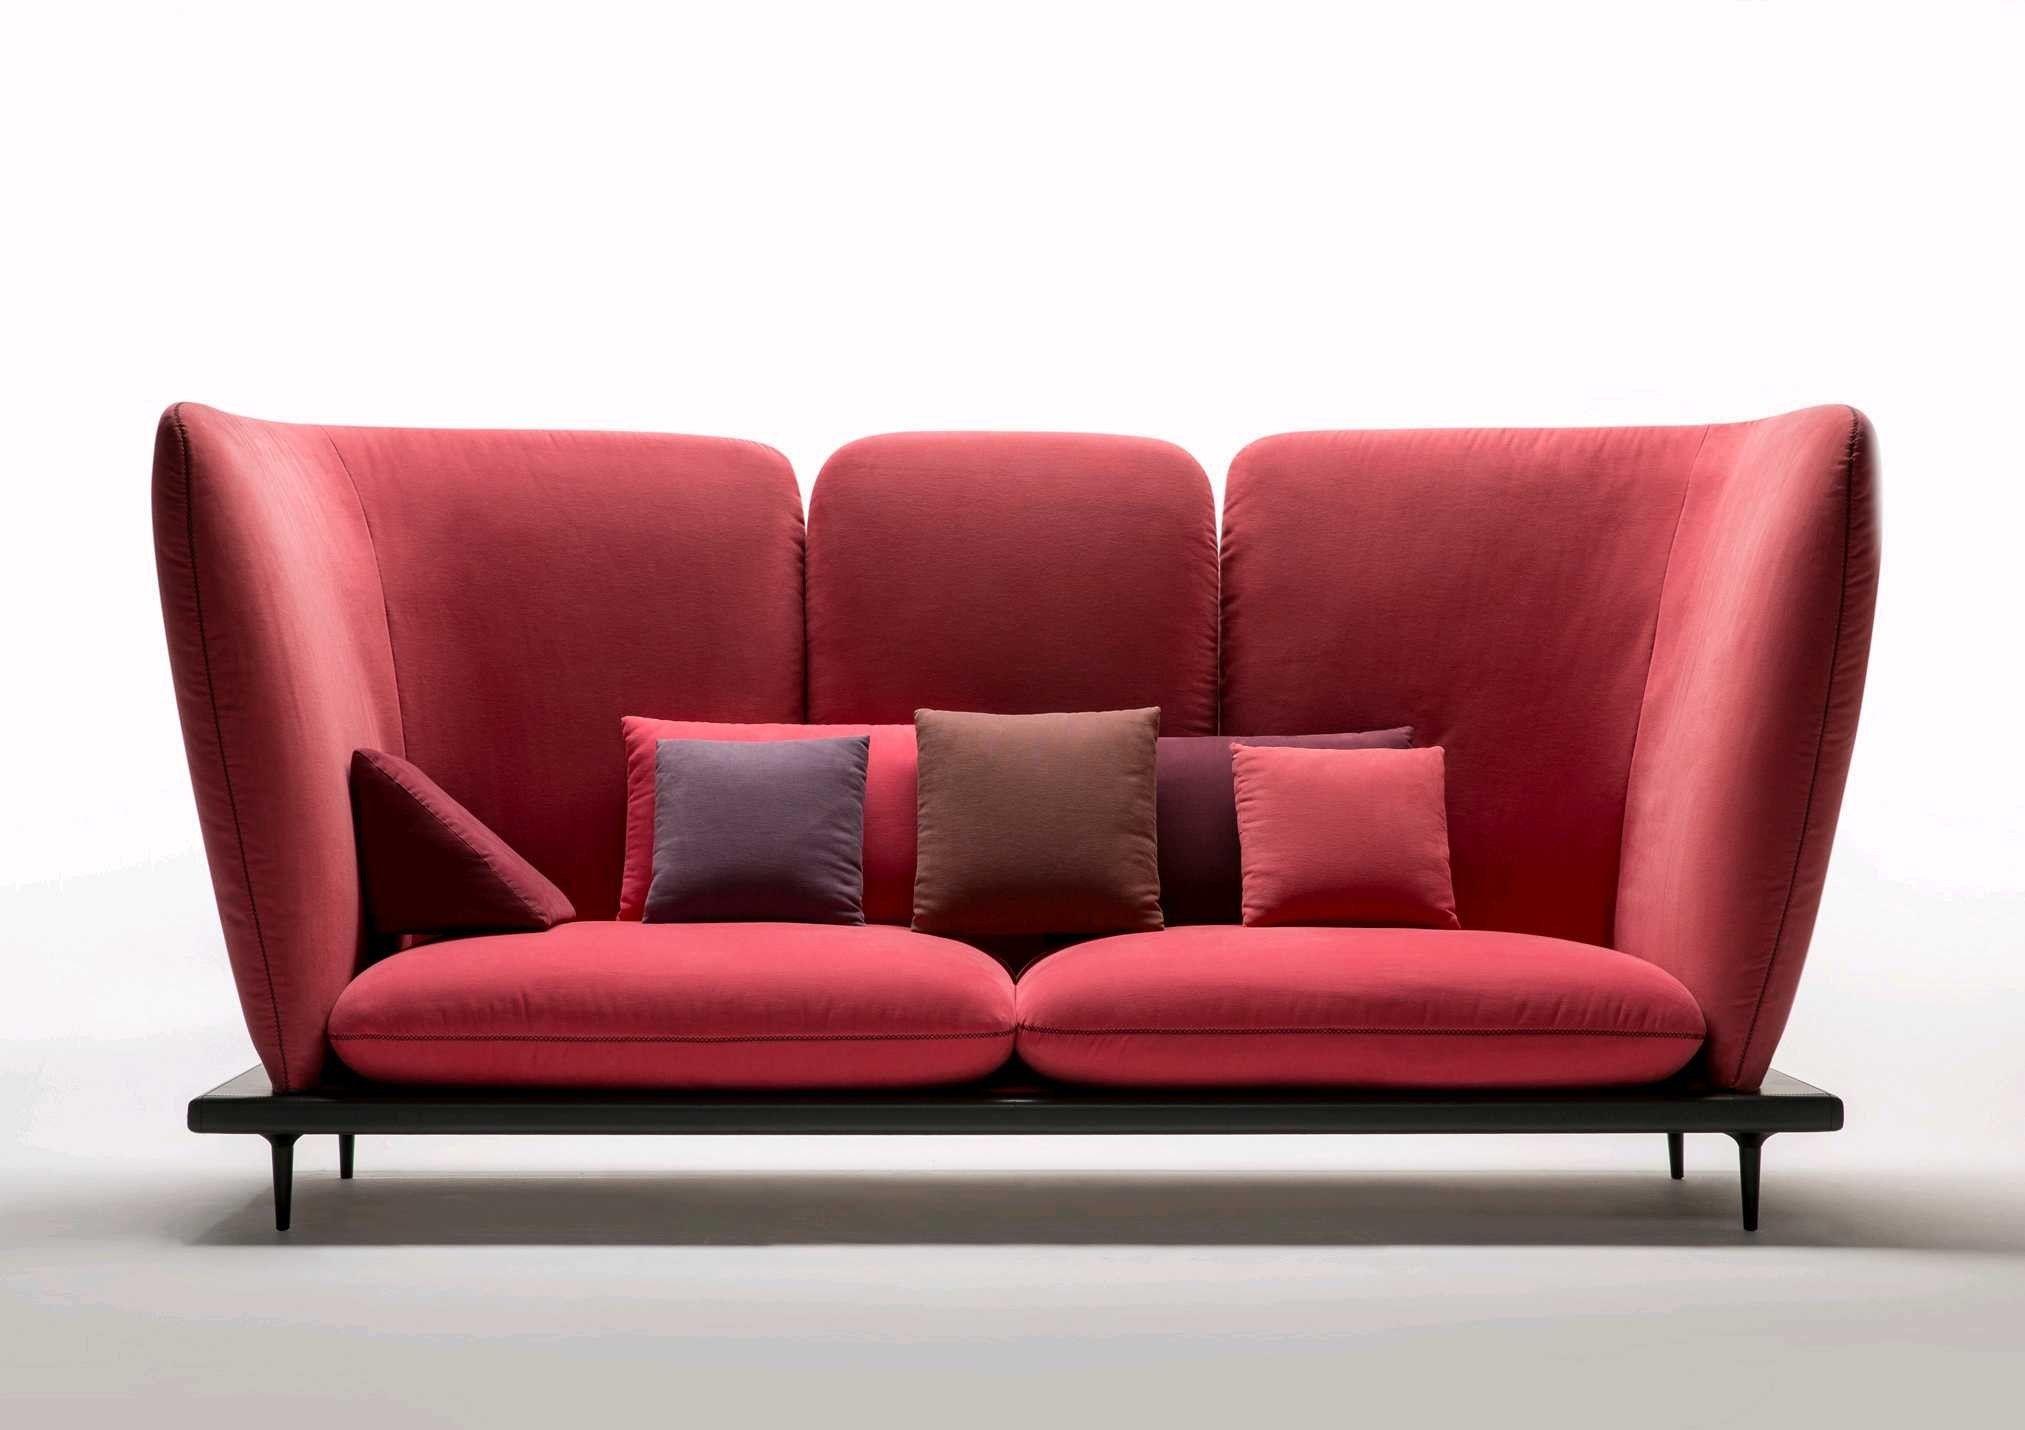 Very Pretty Italian Sofa Designs Sofa And Loveseat Set Modern